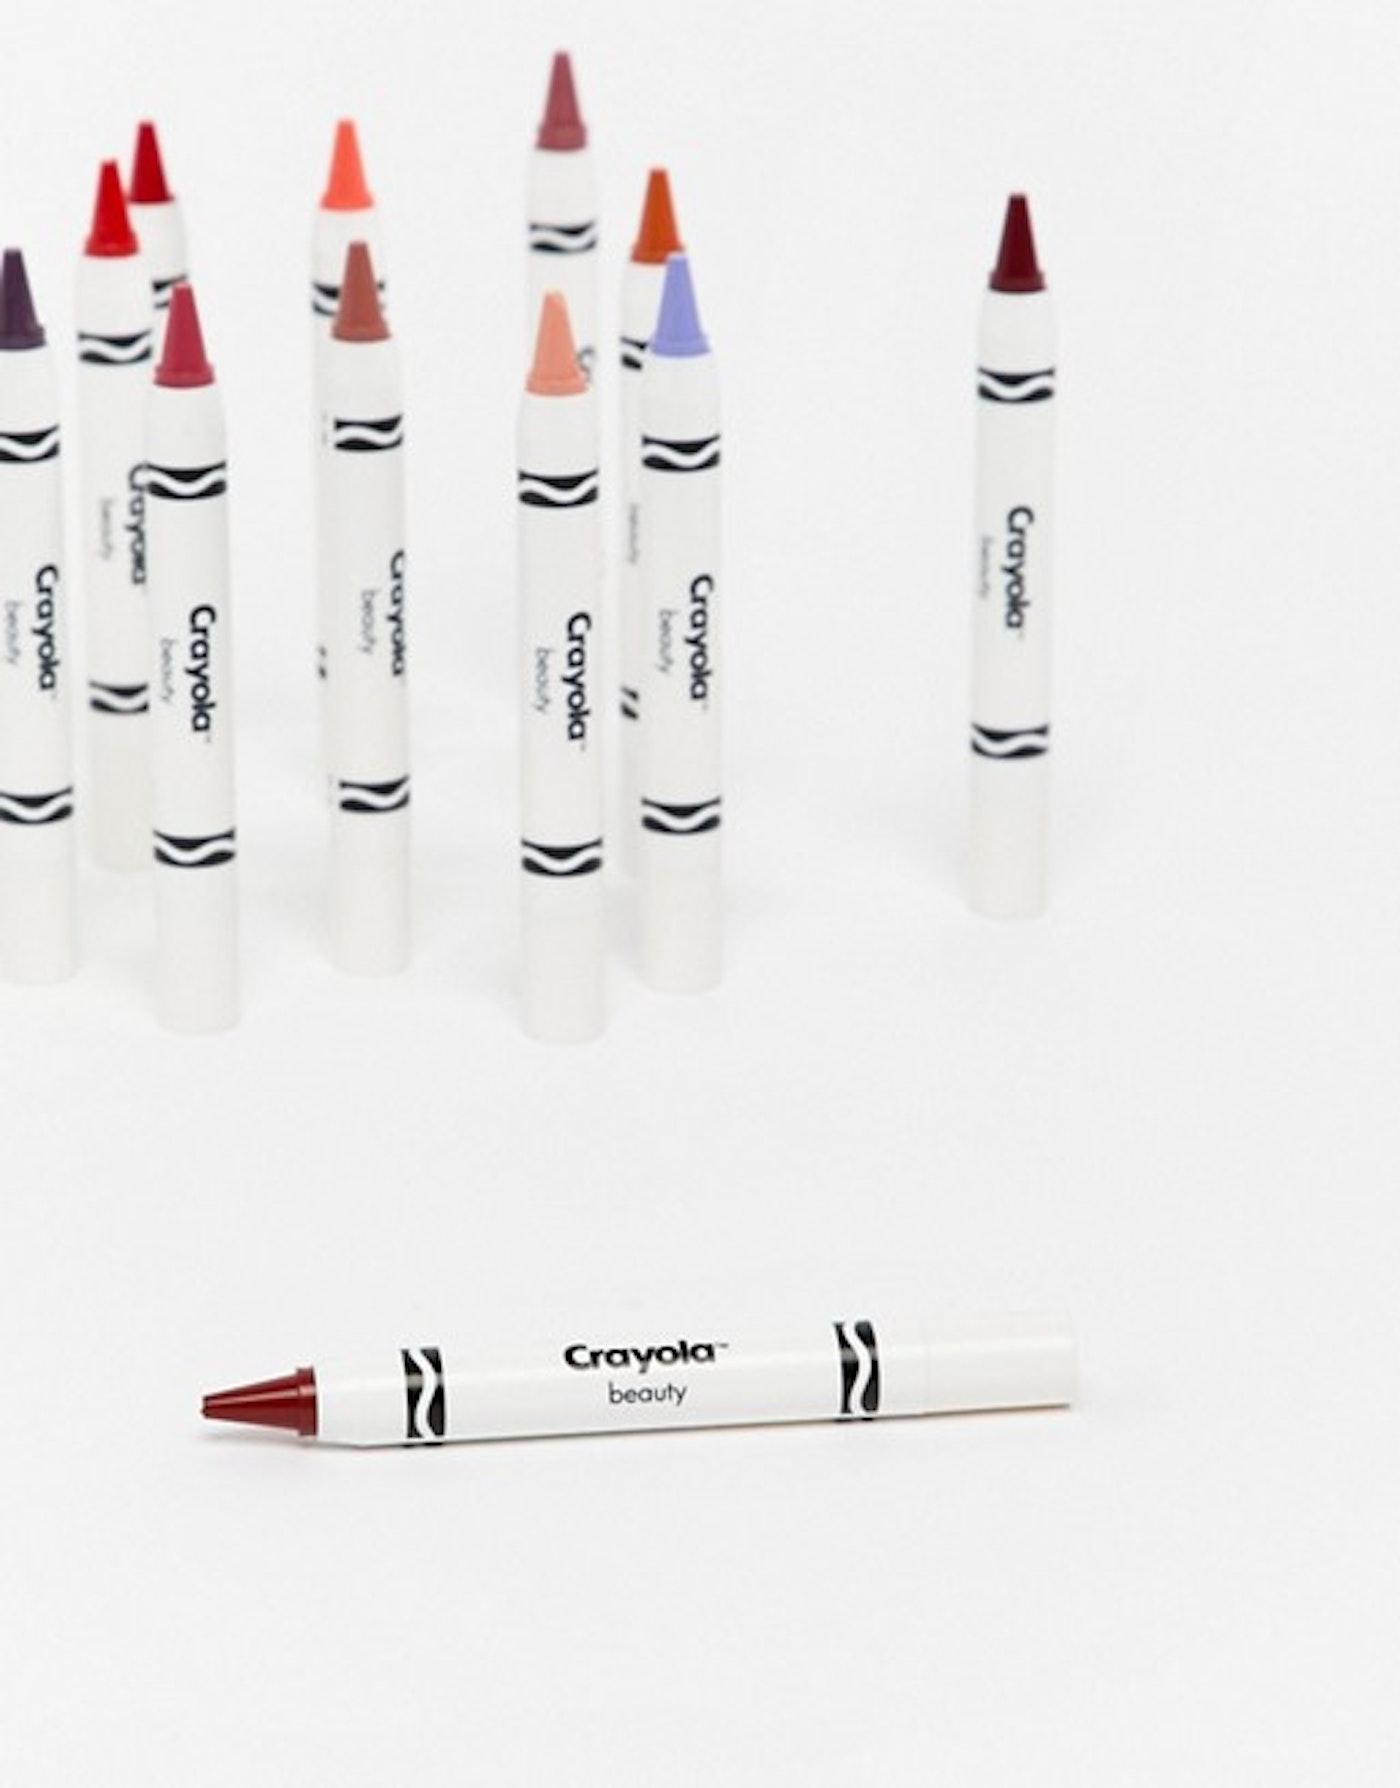 crayolakit